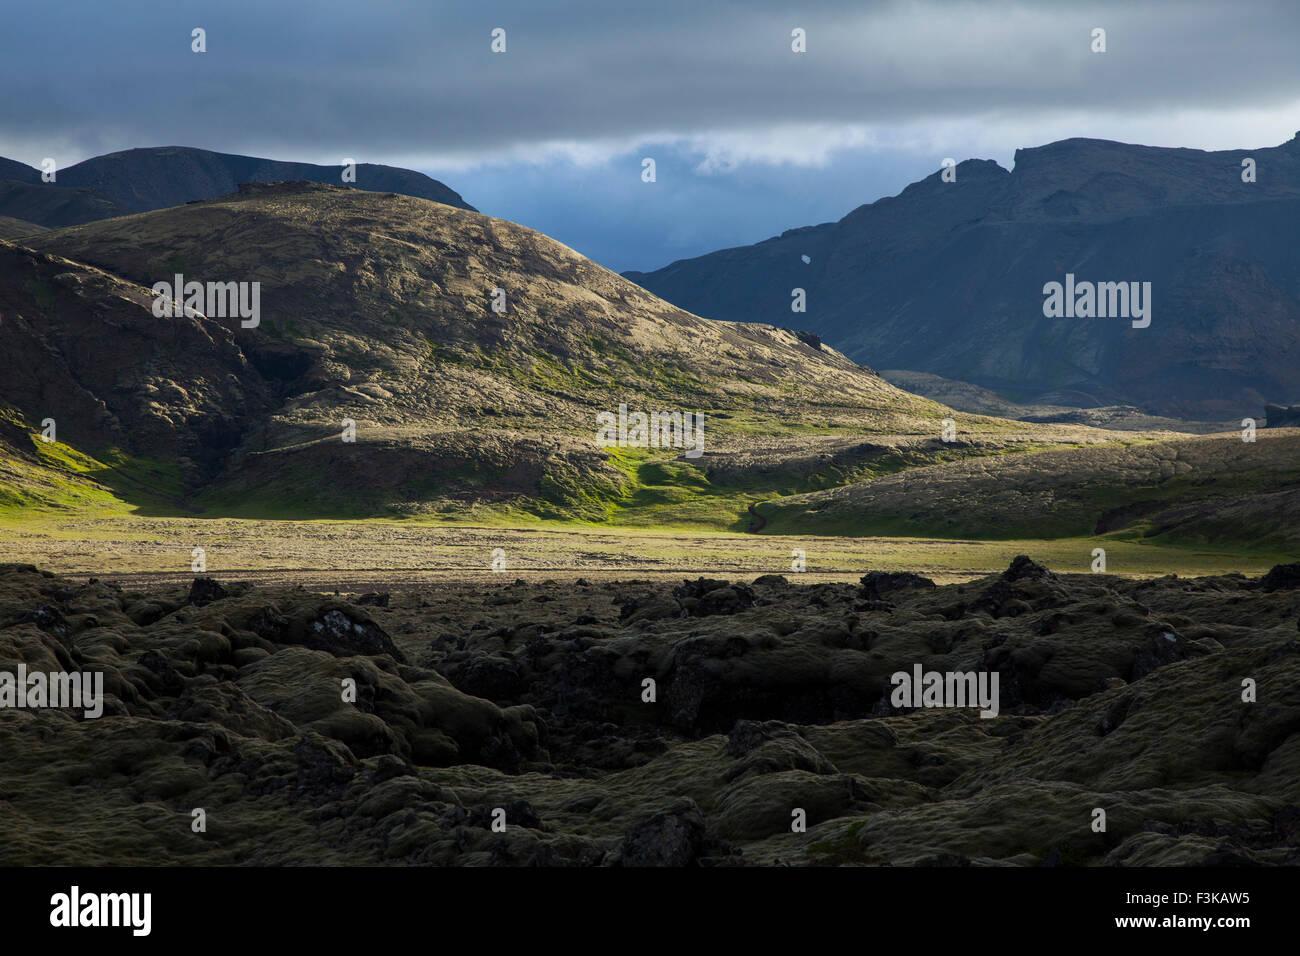 Volcanic mountain landscape near Hveragerdi, Sudherland, Iceland. - Stock Image